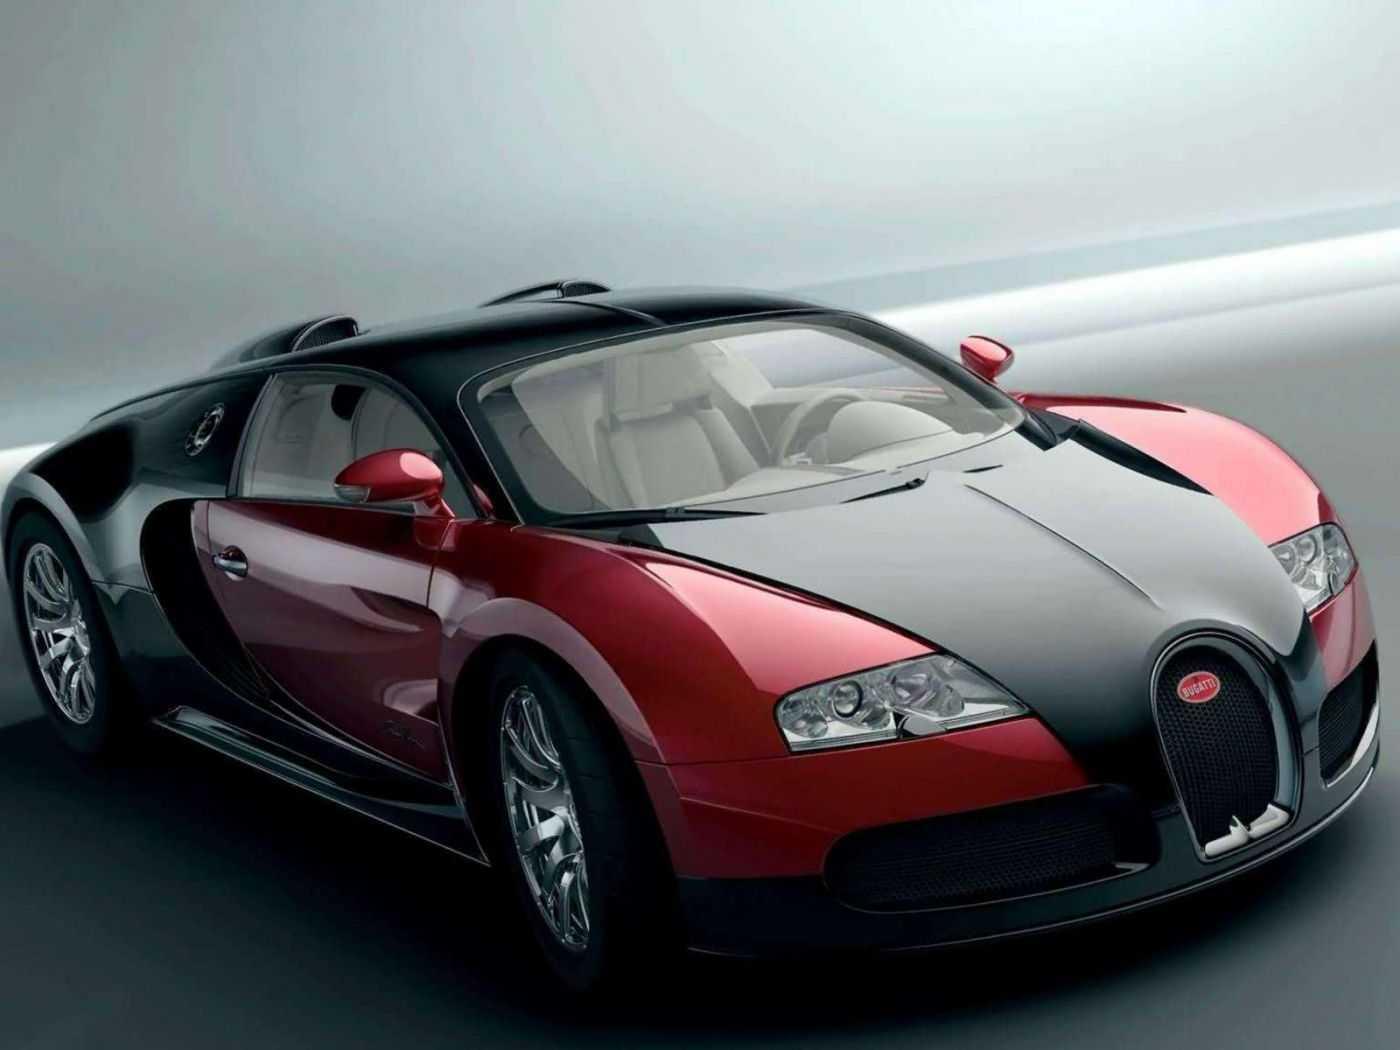 http://4.bp.blogspot.com/-SjGUmTfvILU/TprWokWXL-I/AAAAAAAAAHM/WBzKiboUzPM/s1600/j-alphabet-bugatti-veyron-supercars-telugu-songs-118571.jpg